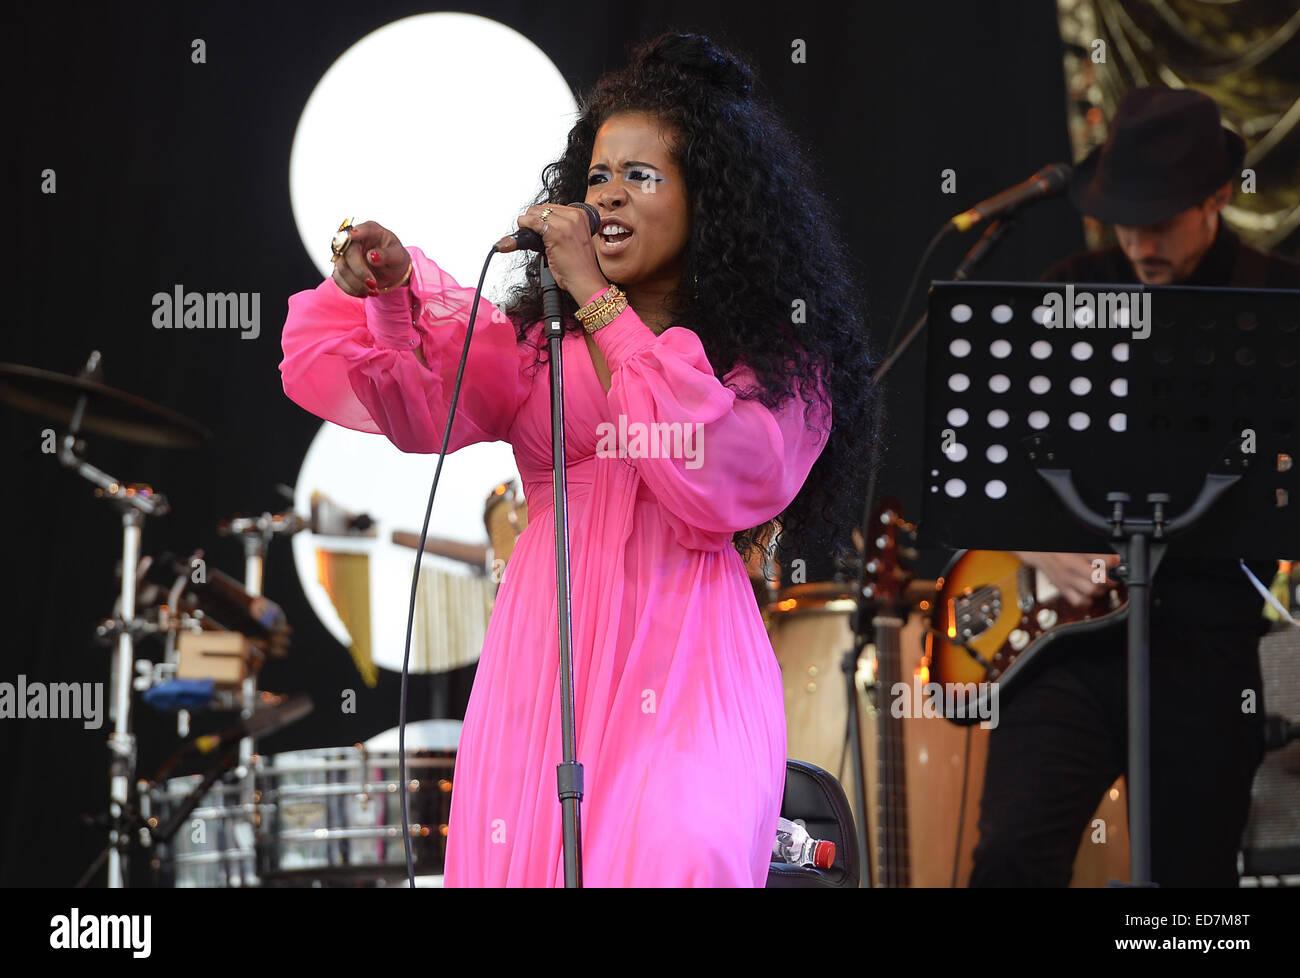 Glastonbury Festival 2014 - Performances - Jour 3 comprend: Kelis Où: Glastonbury, Royaume-Uni Photo Stock